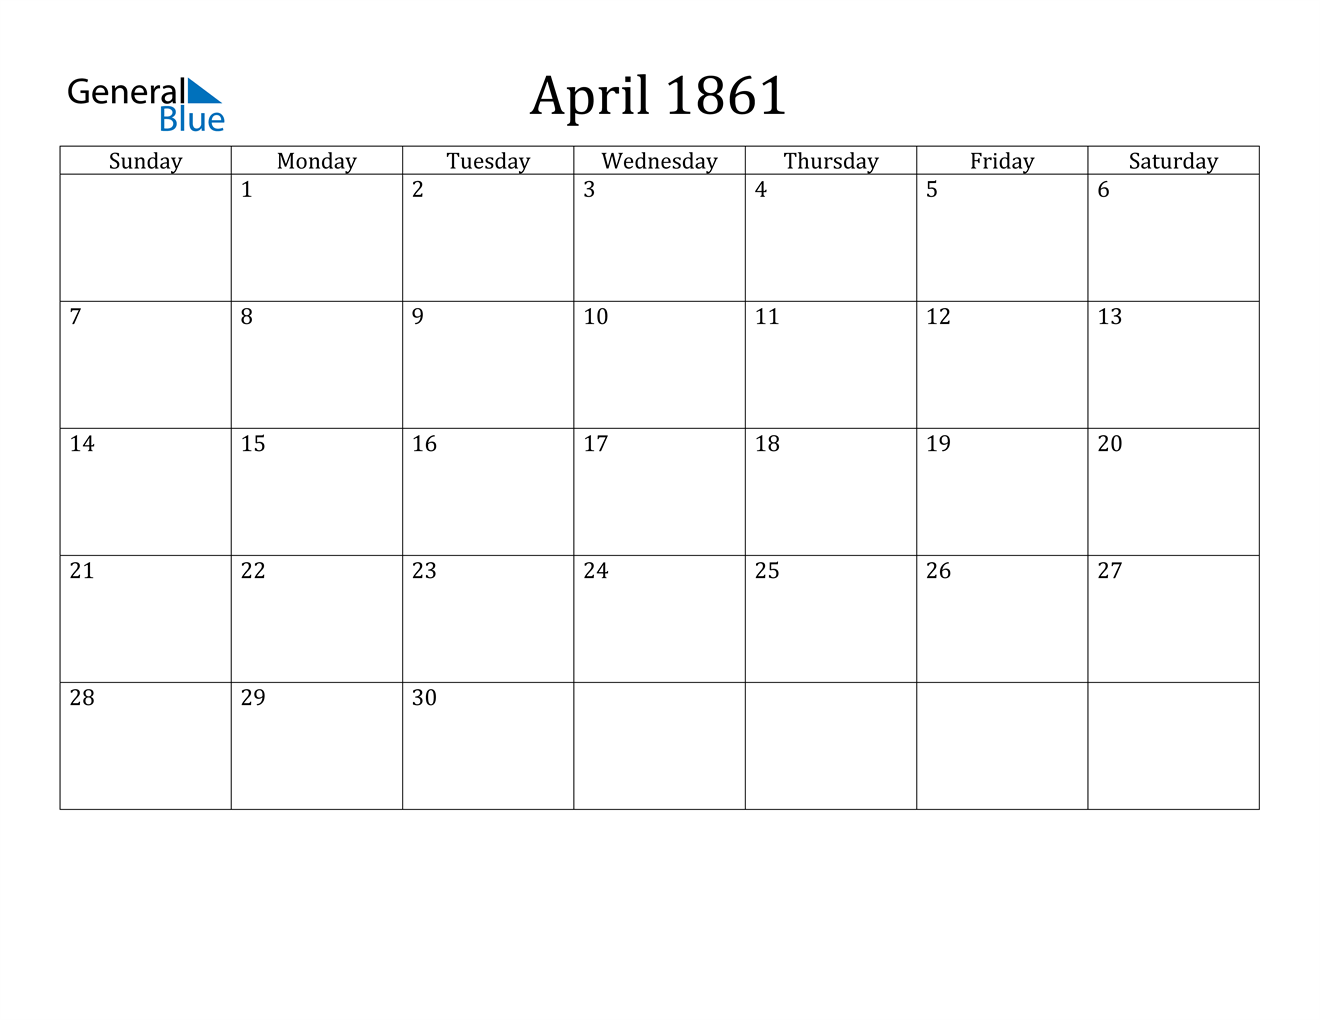 Image of April 1861 Calendar